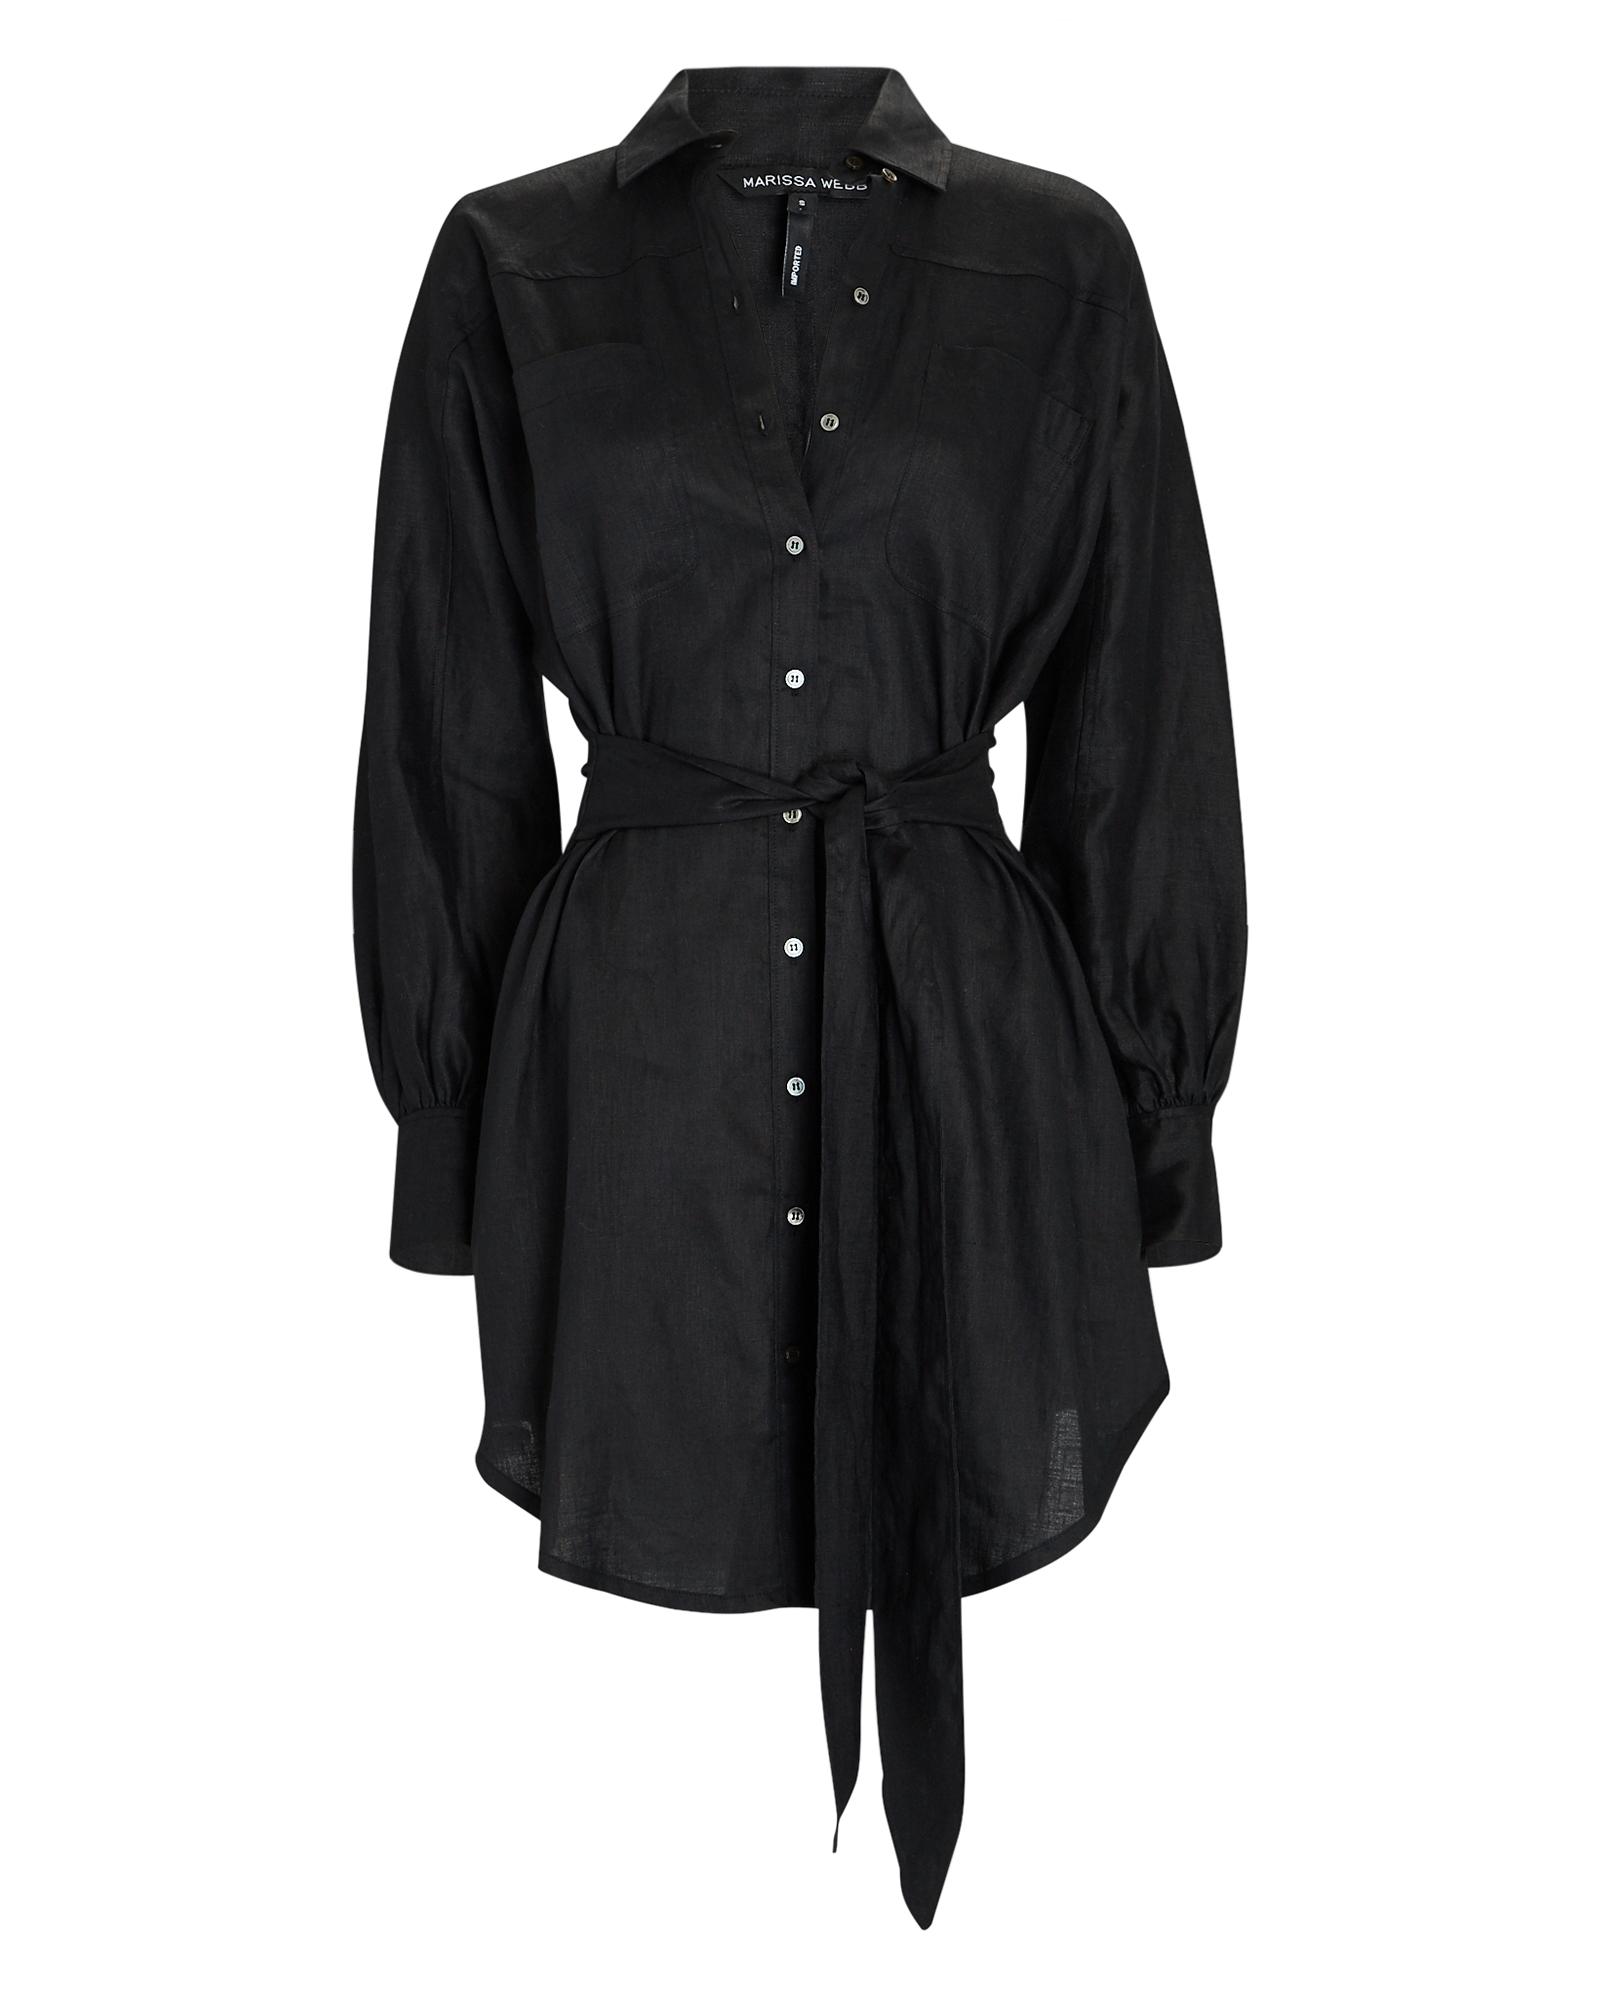 Marissa Webb Emerson Linen Tie-Front Mini Dress